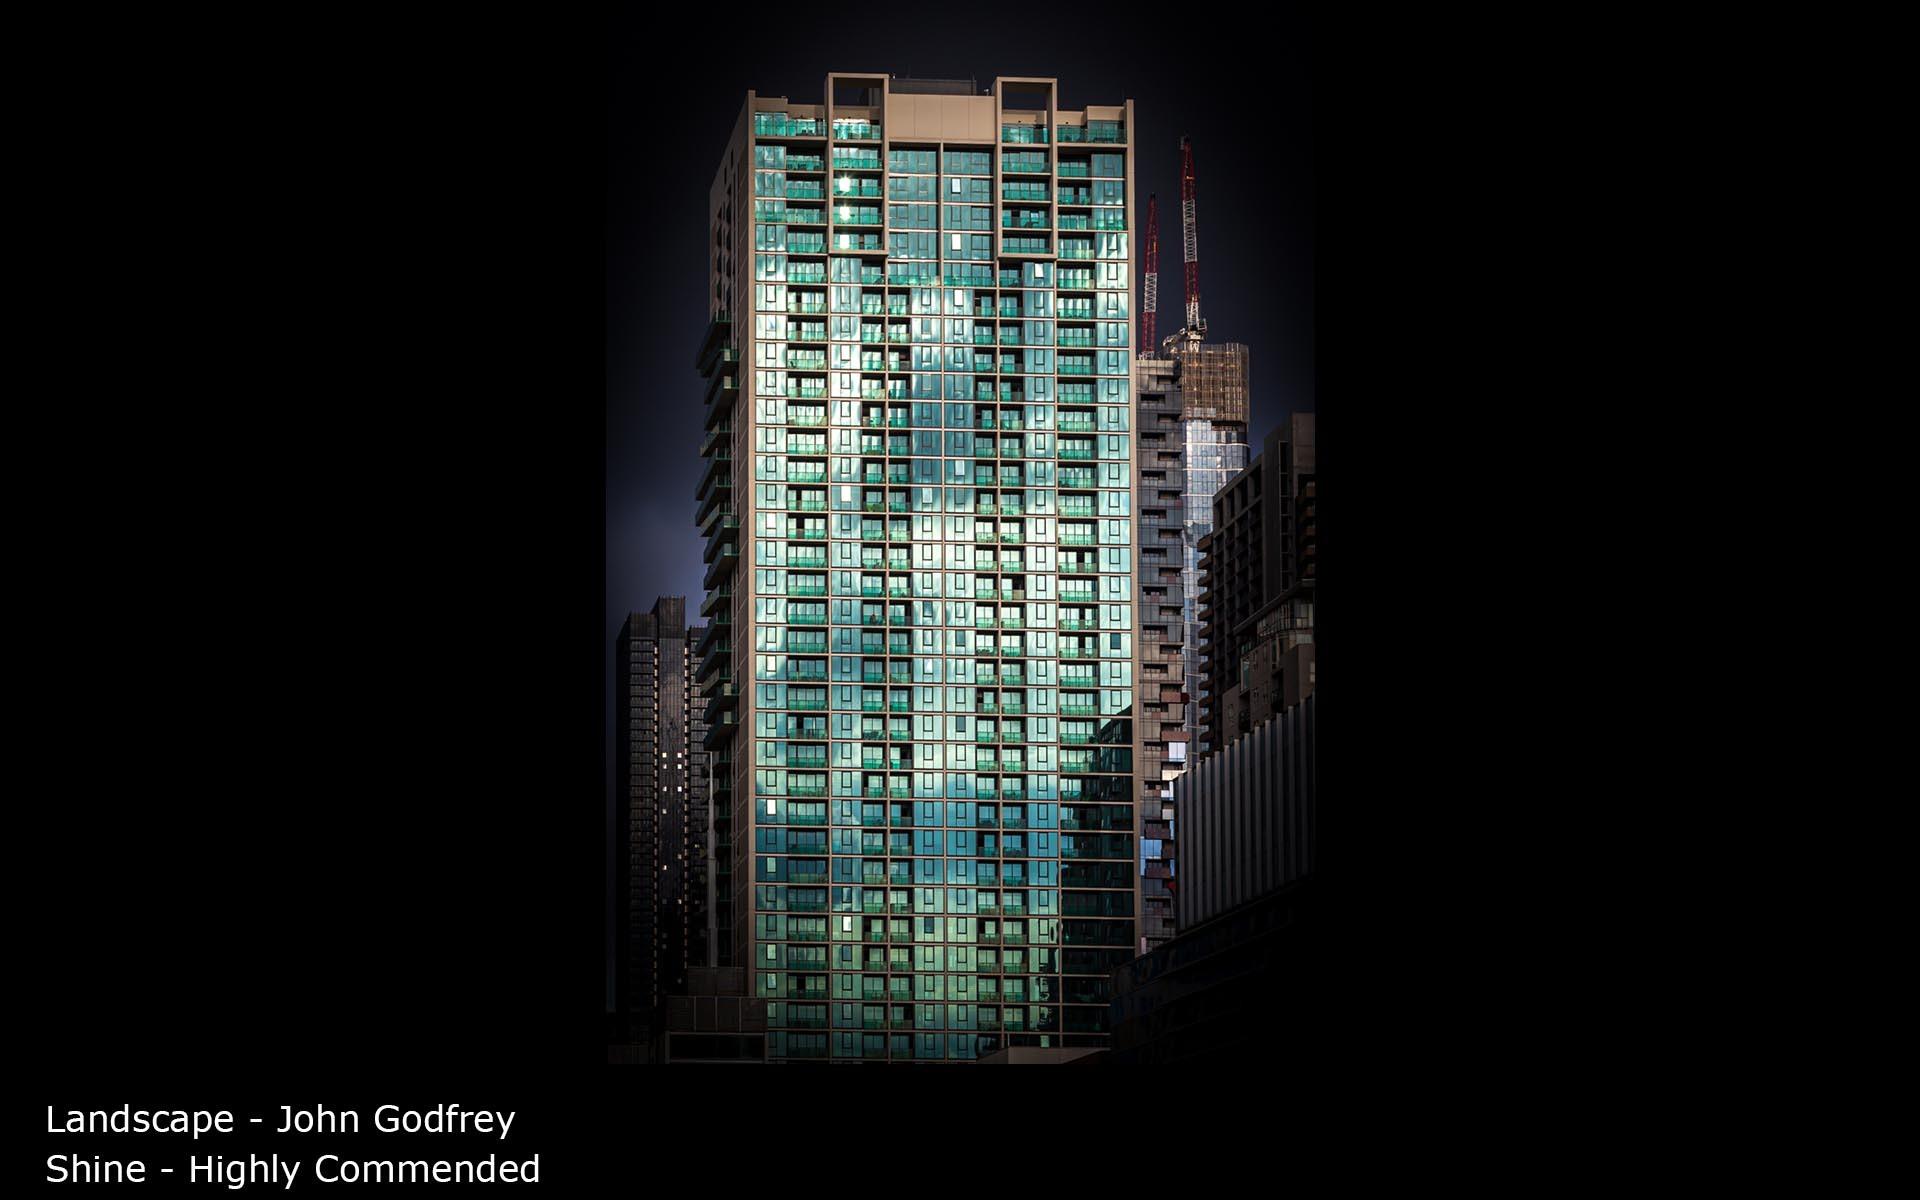 Shine - John Godfrey